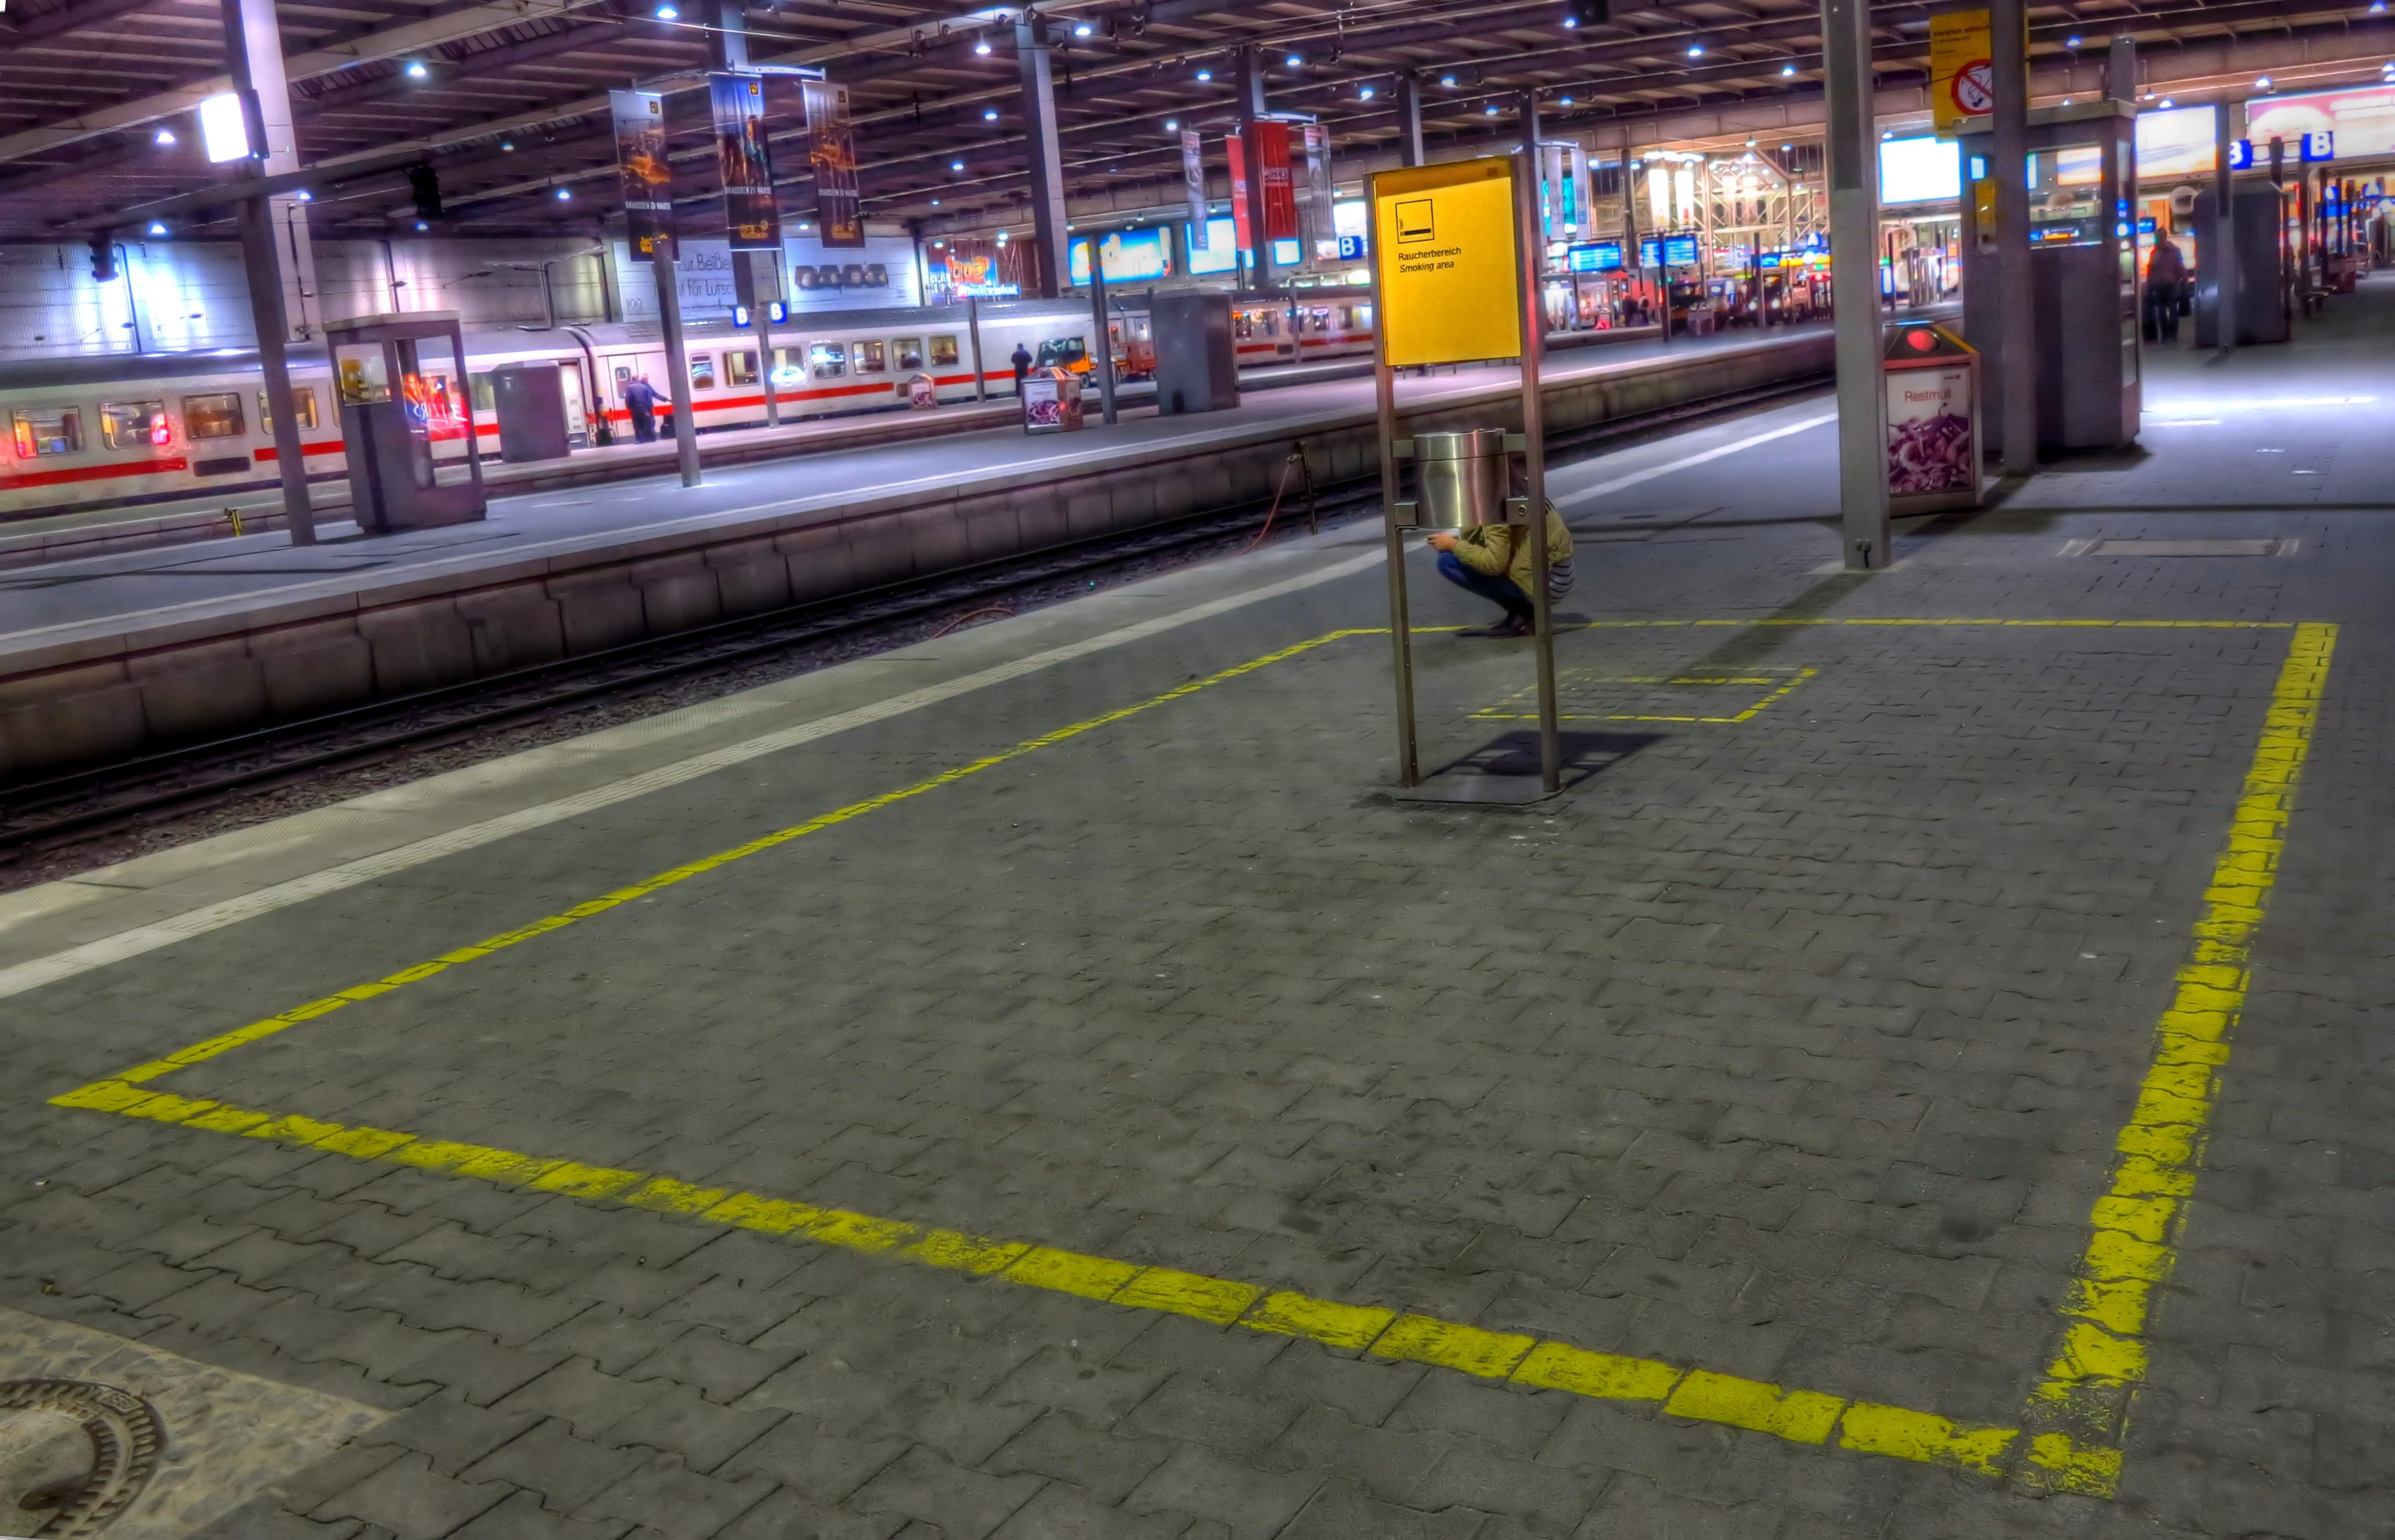 http://upload.wikimedia.org/wikipedia/commons/7/7d/M%C3%BCnchen_Hauptbahnhof_Raucherbereich_Gleis_12-13.jpg